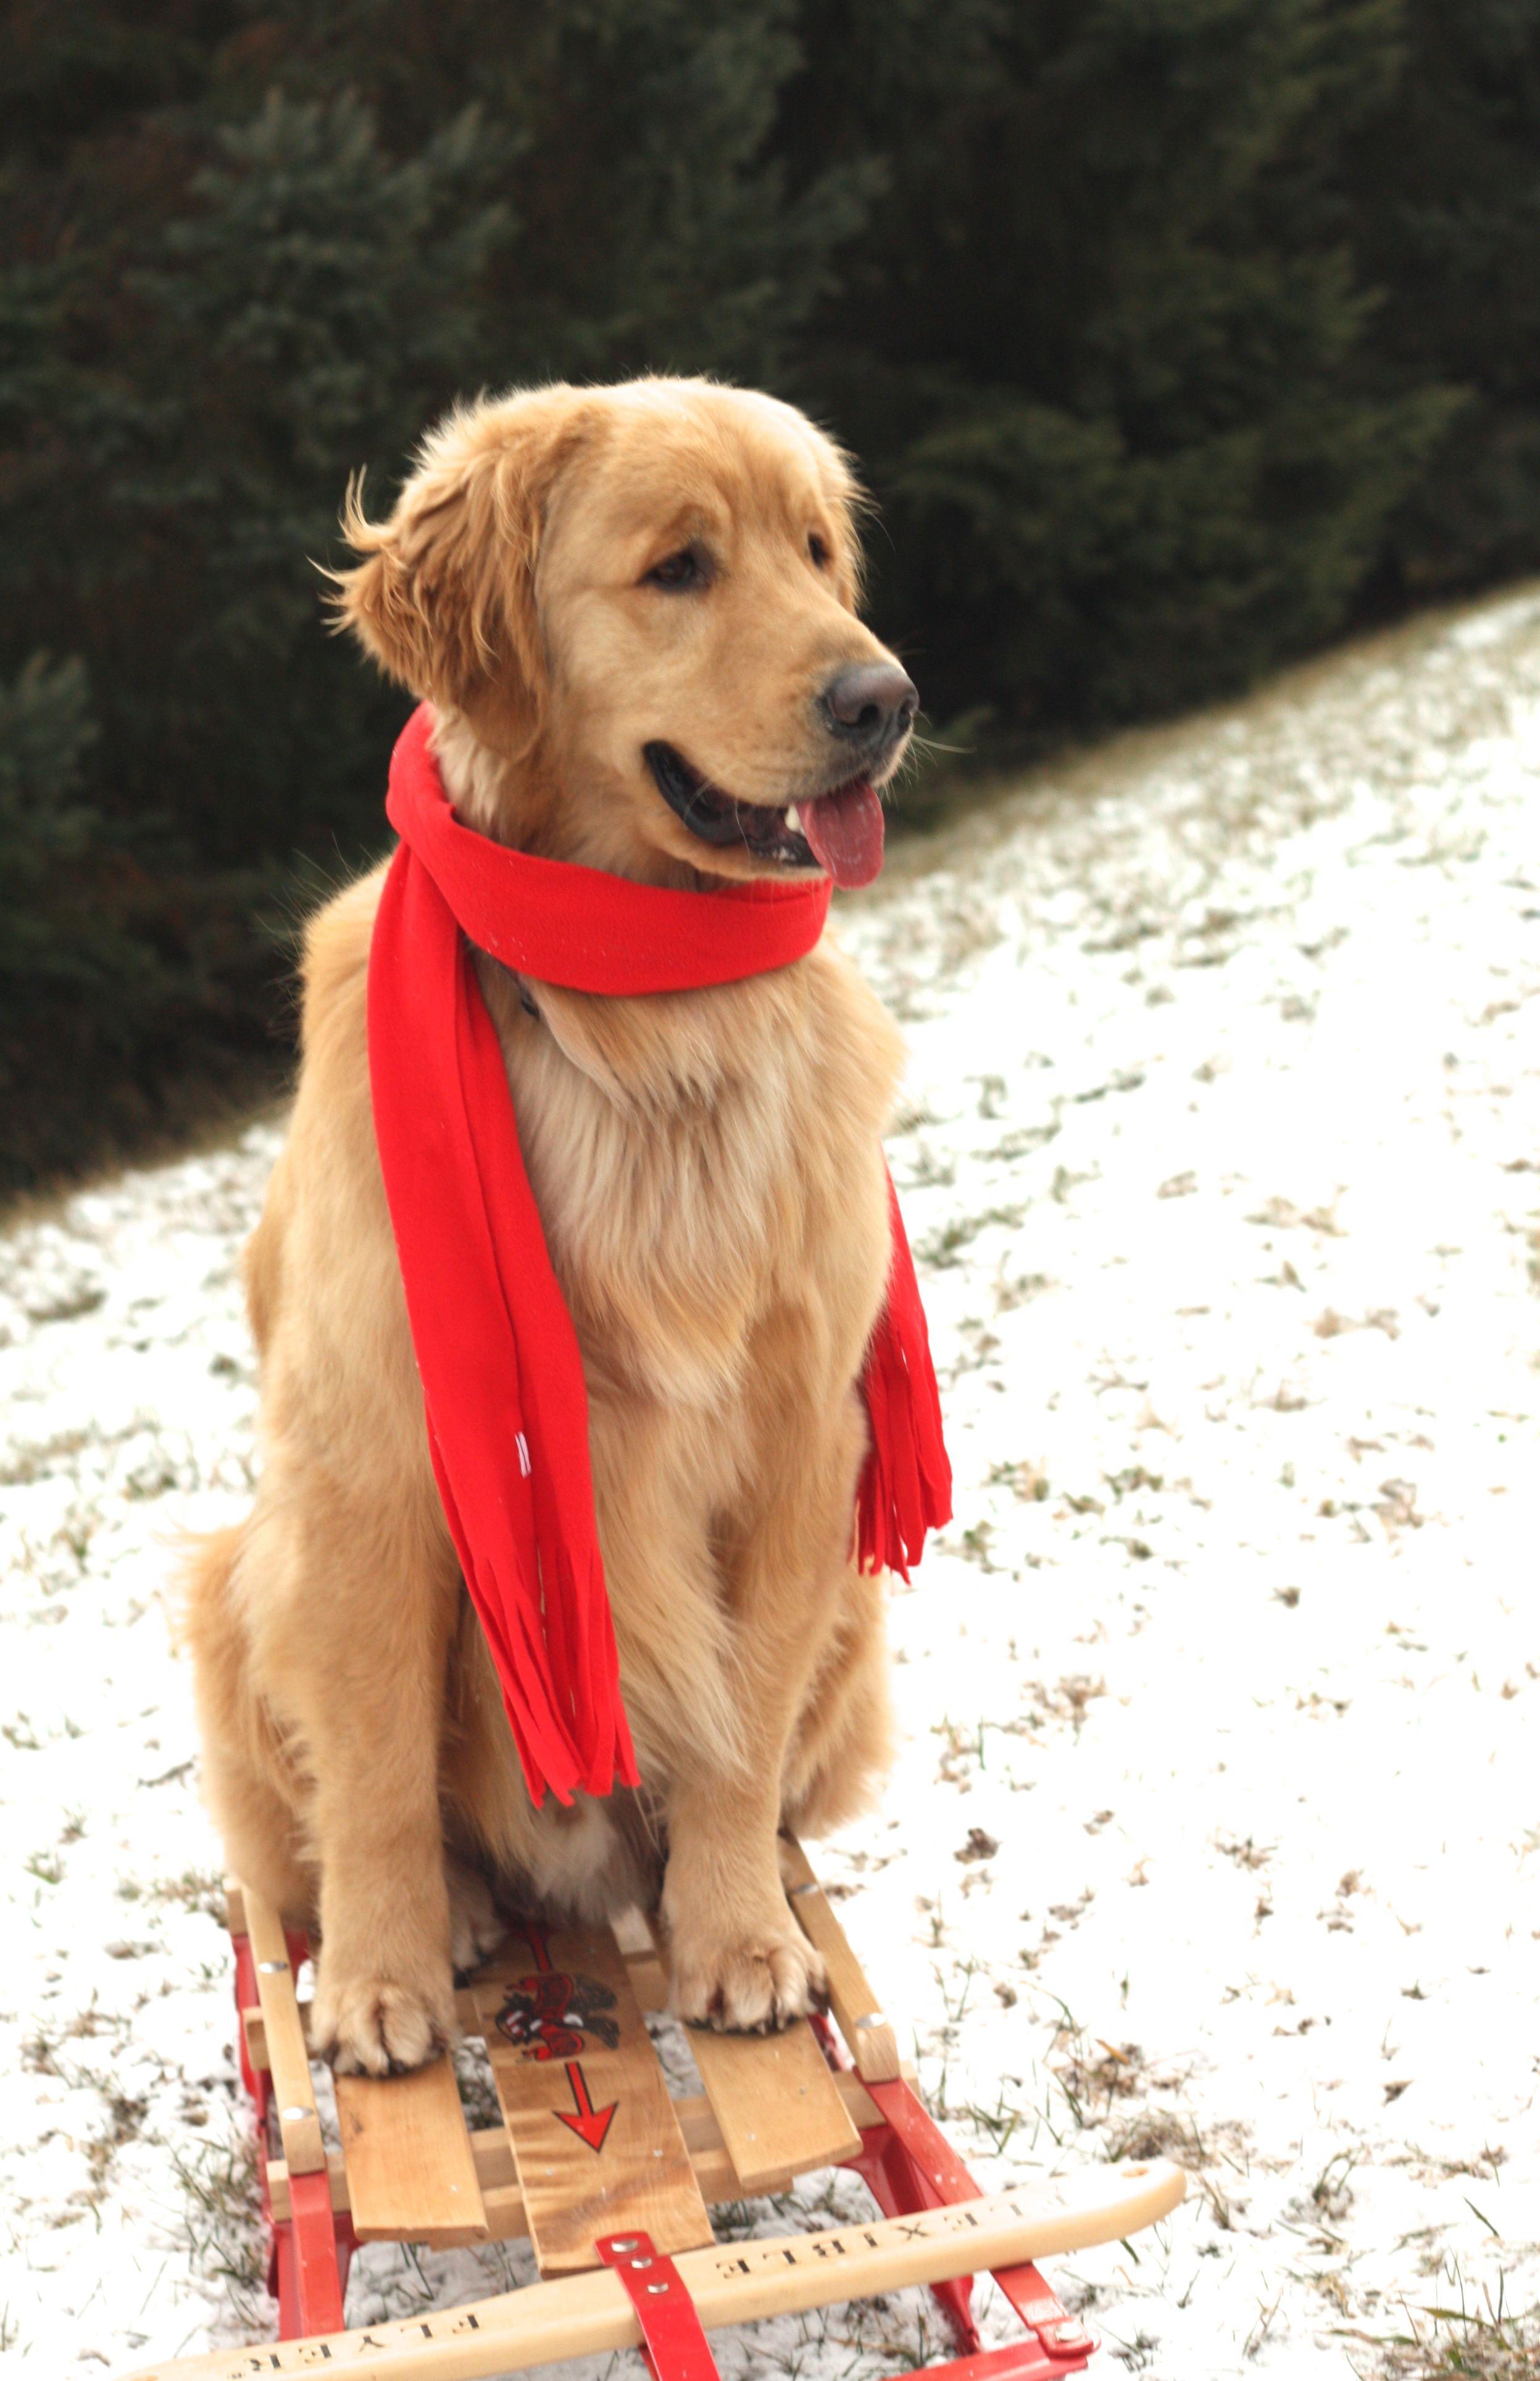 Pin By Lynda Sorrells On So Cute Dogs Golden Retriever